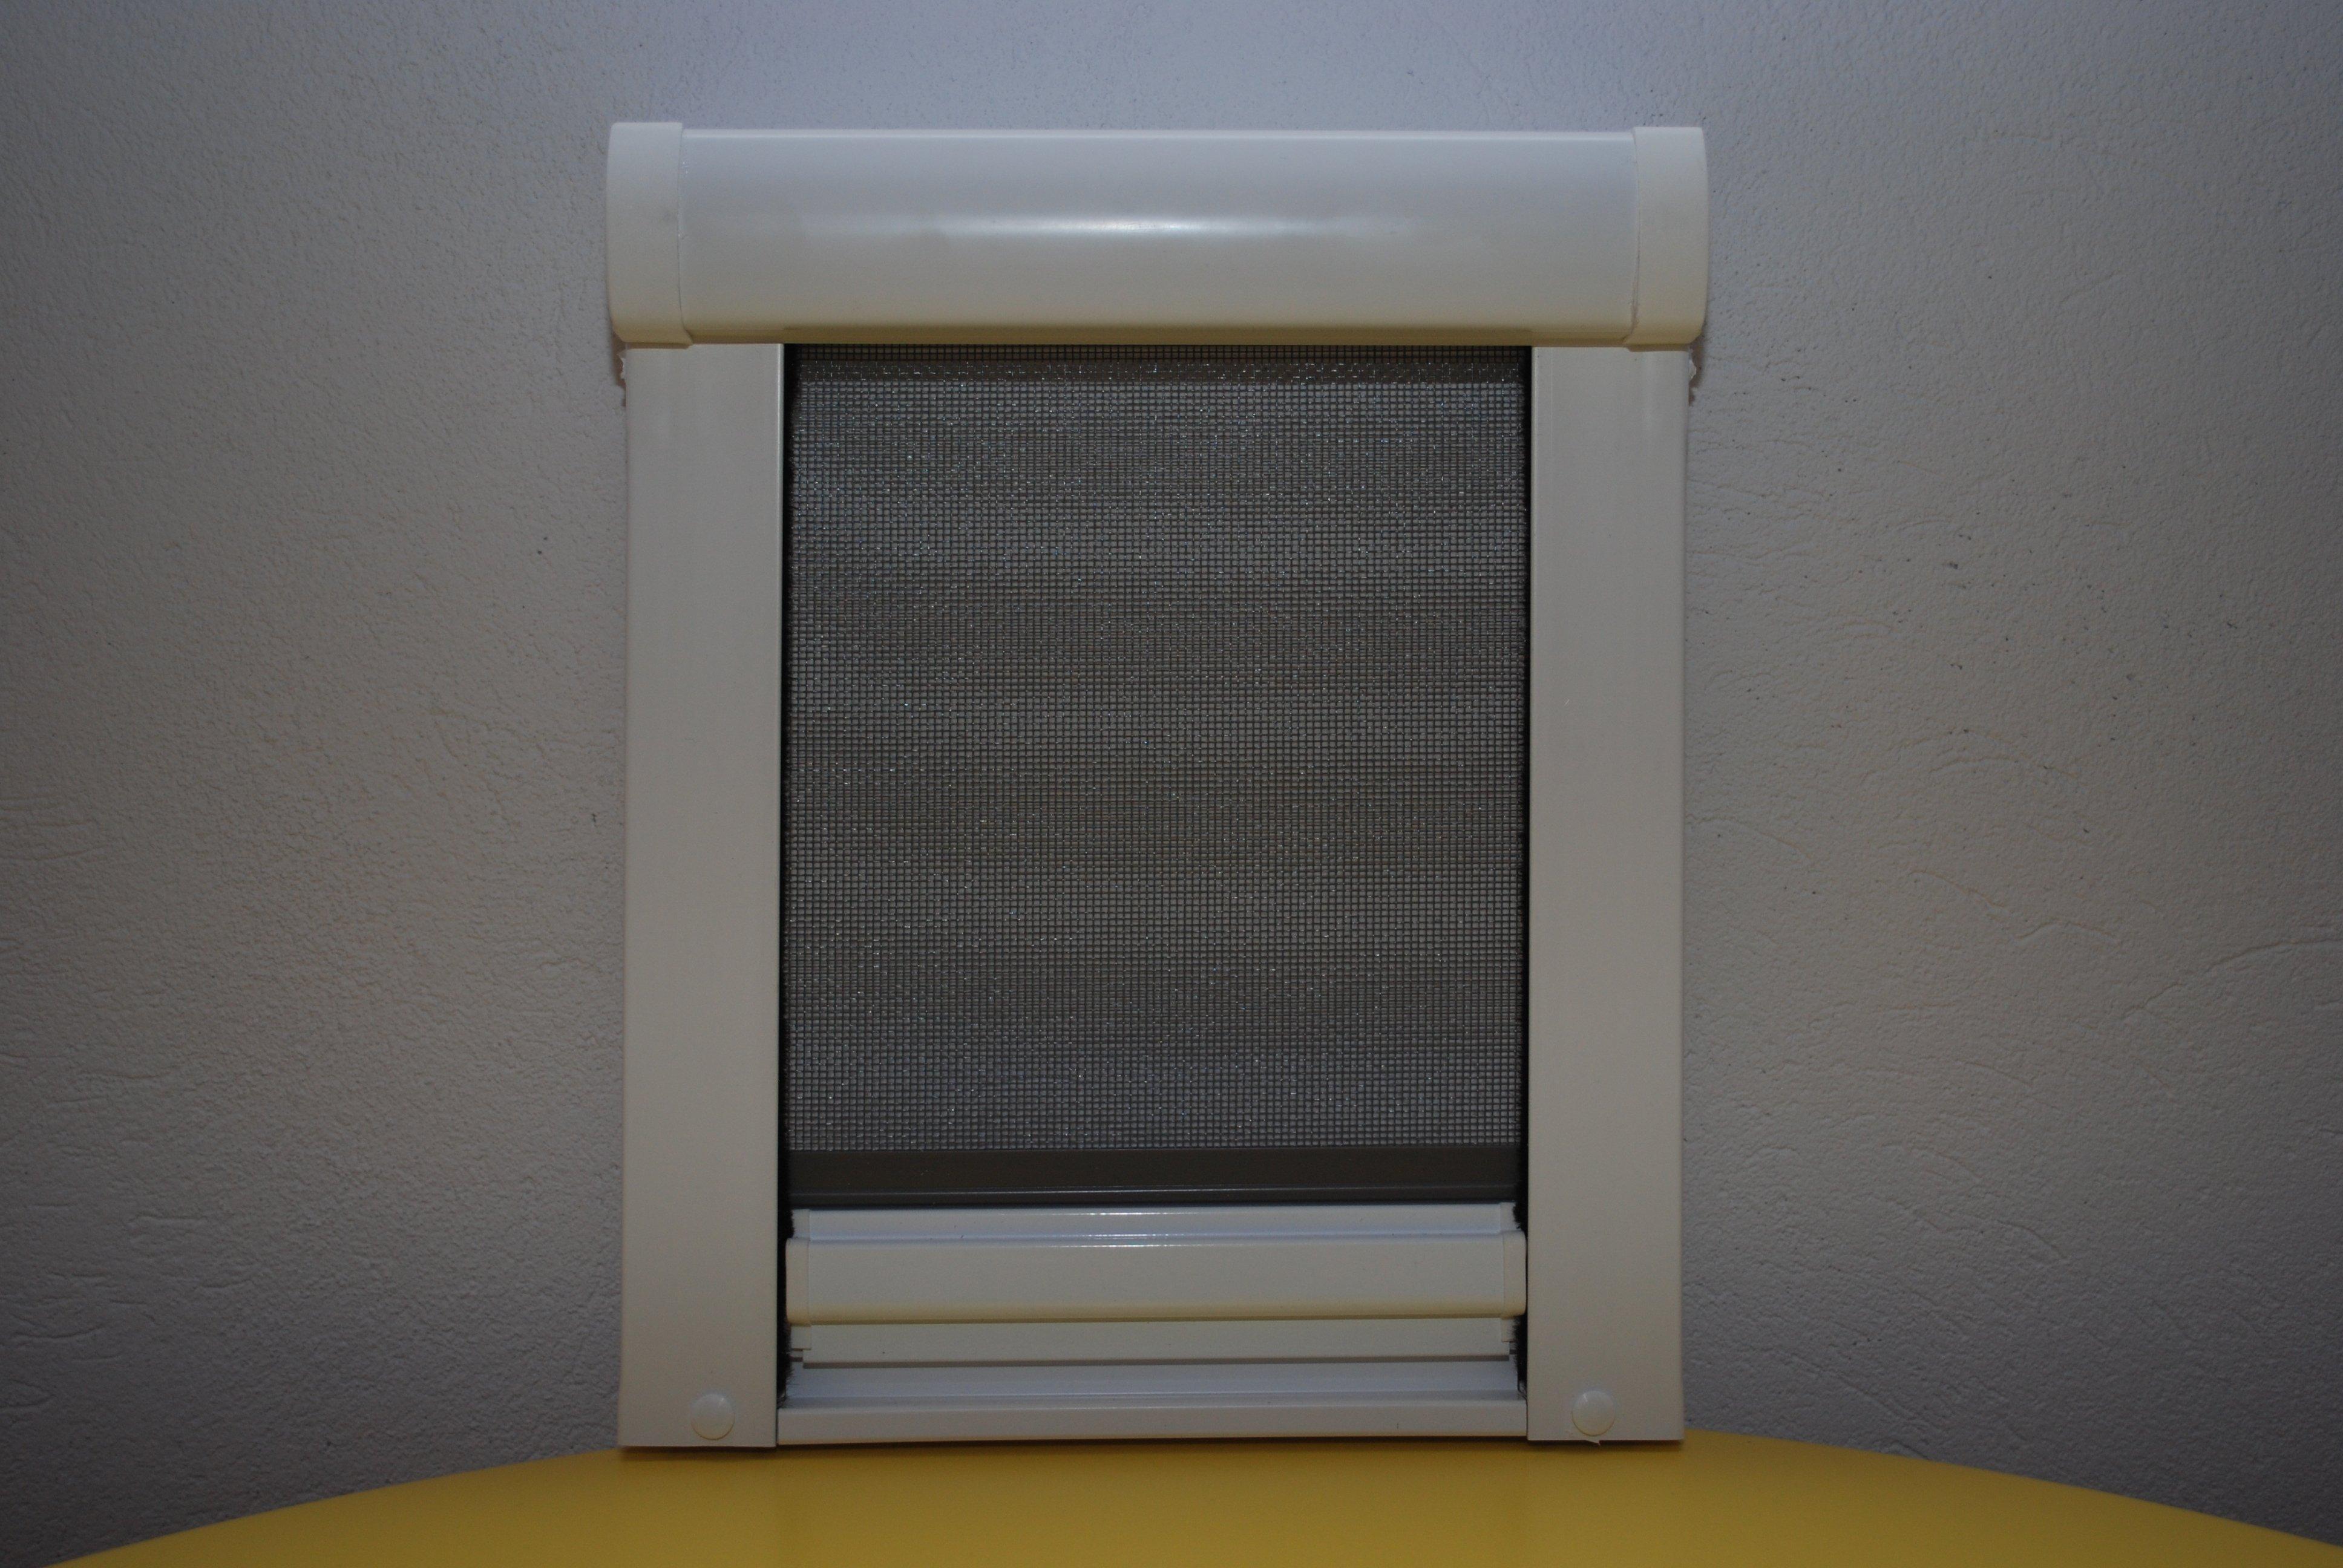 net vindue plast